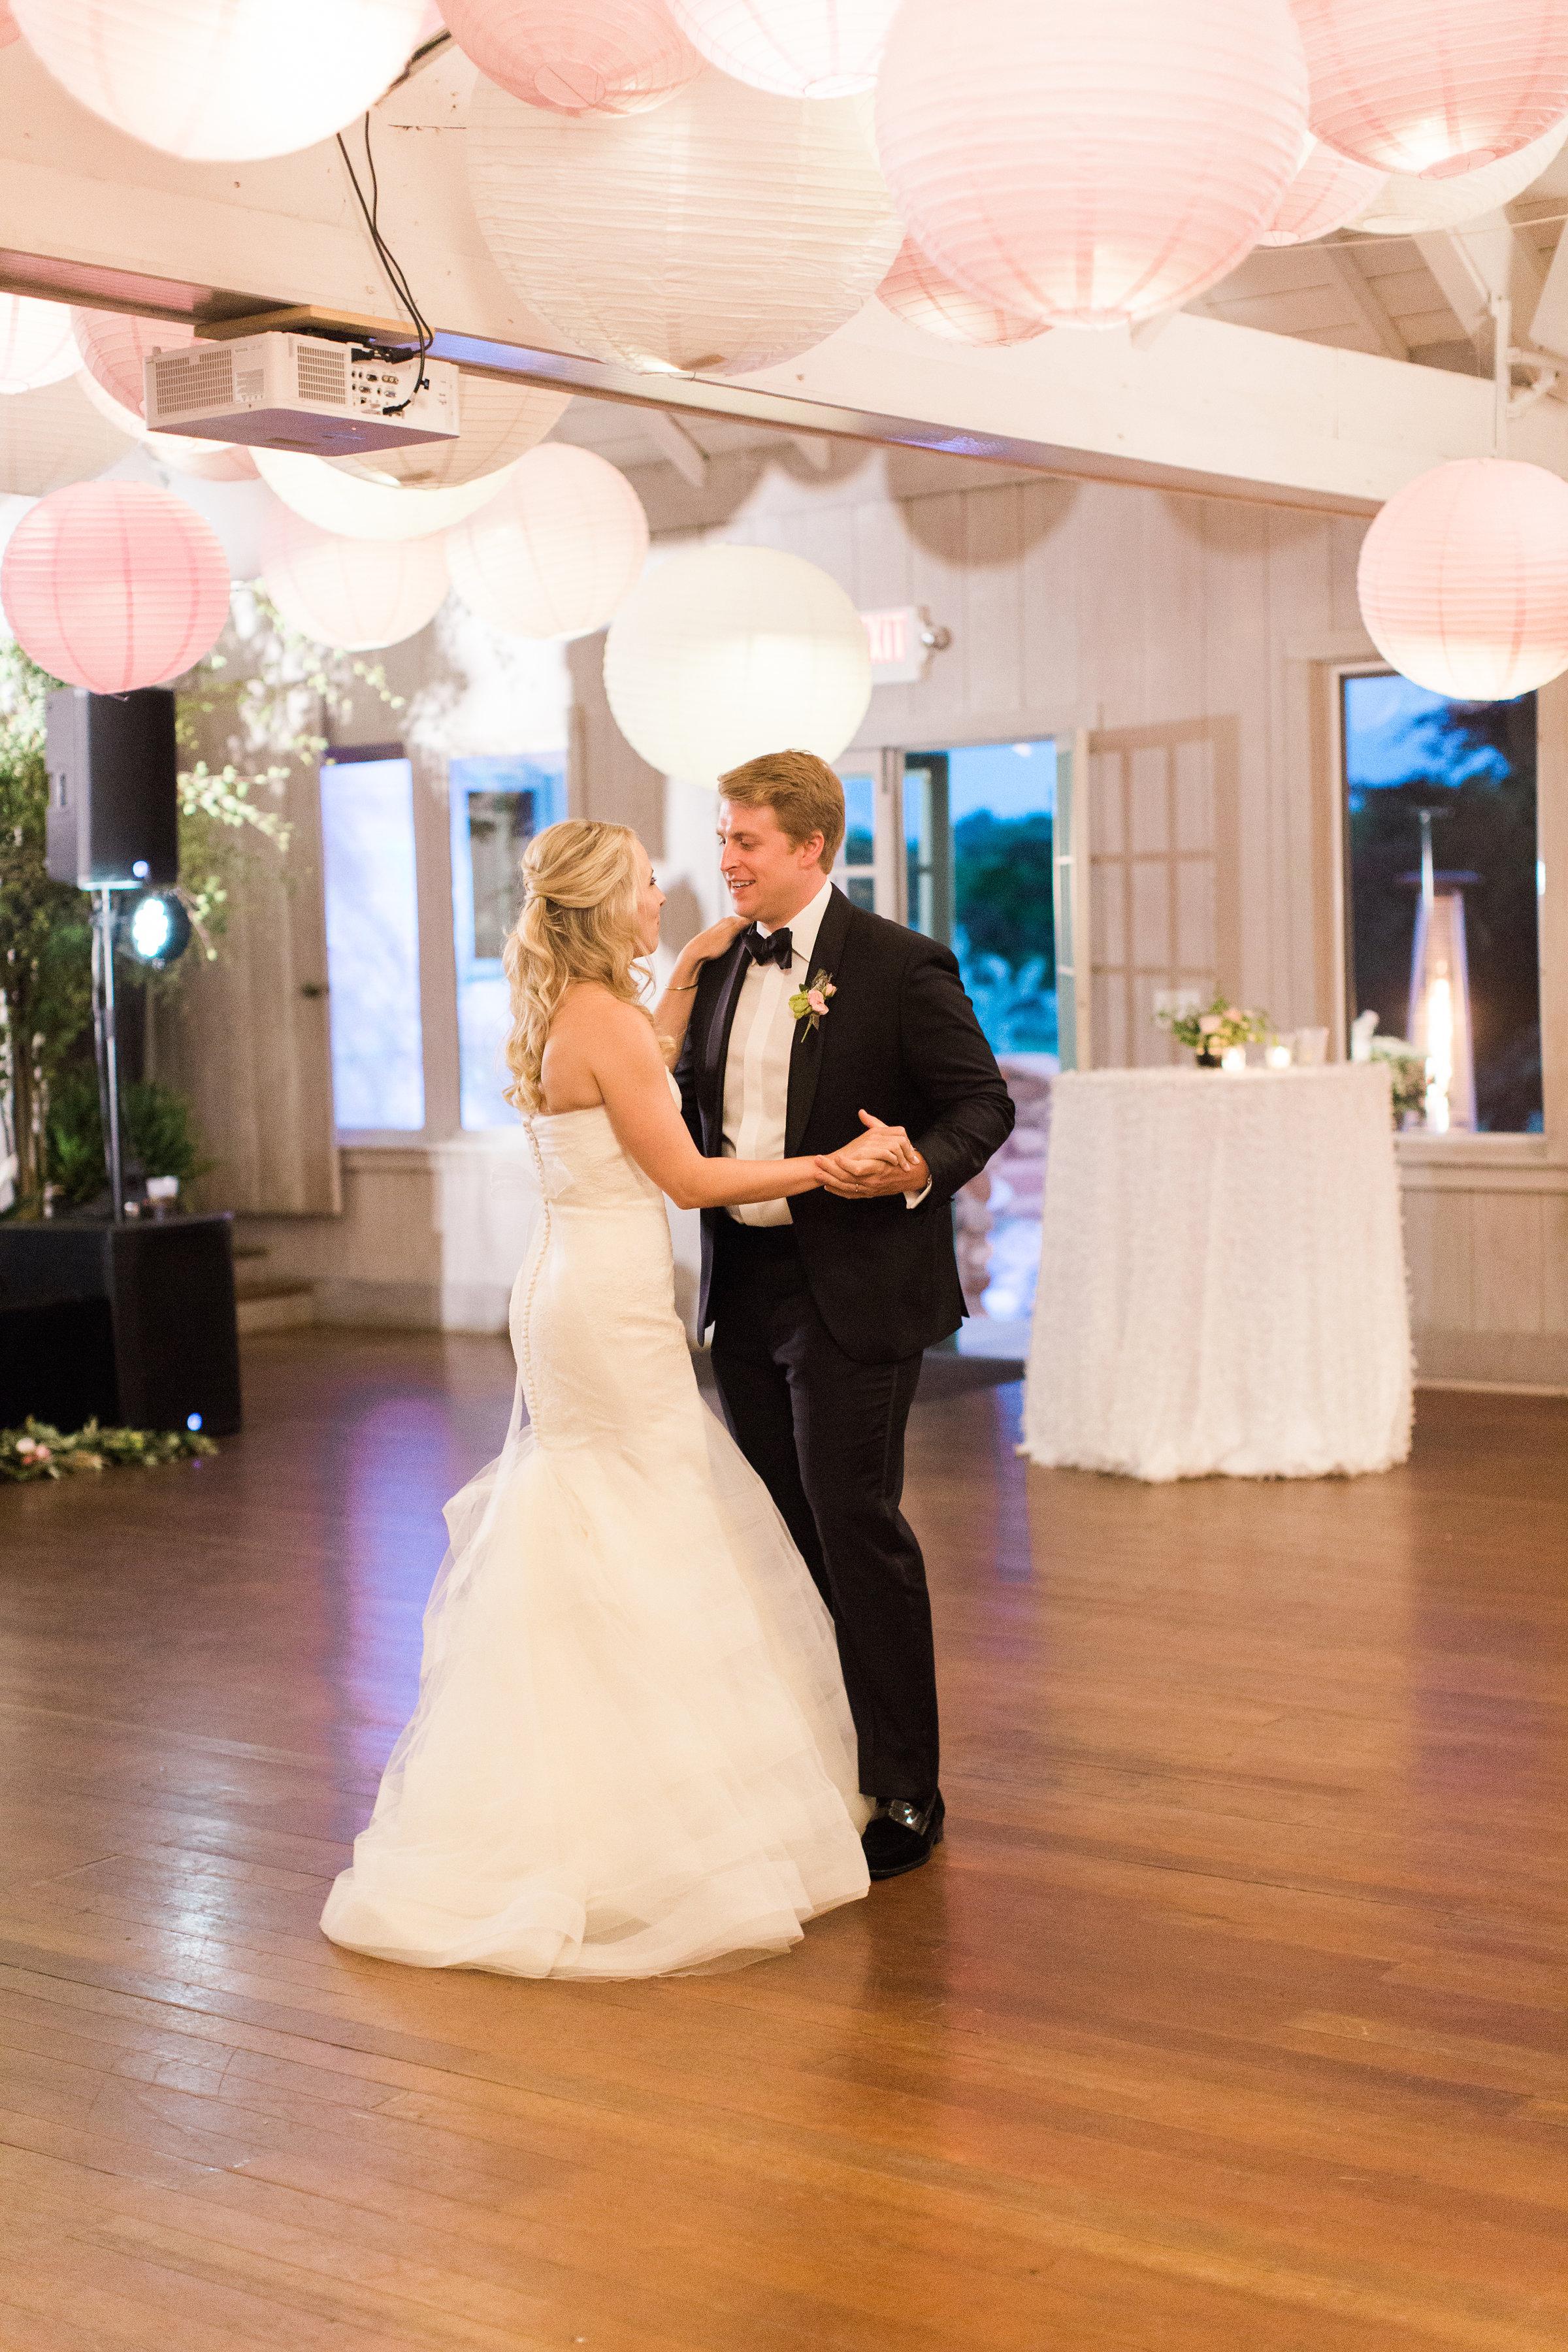 Coffman+Wedding+Reception-174.jpg